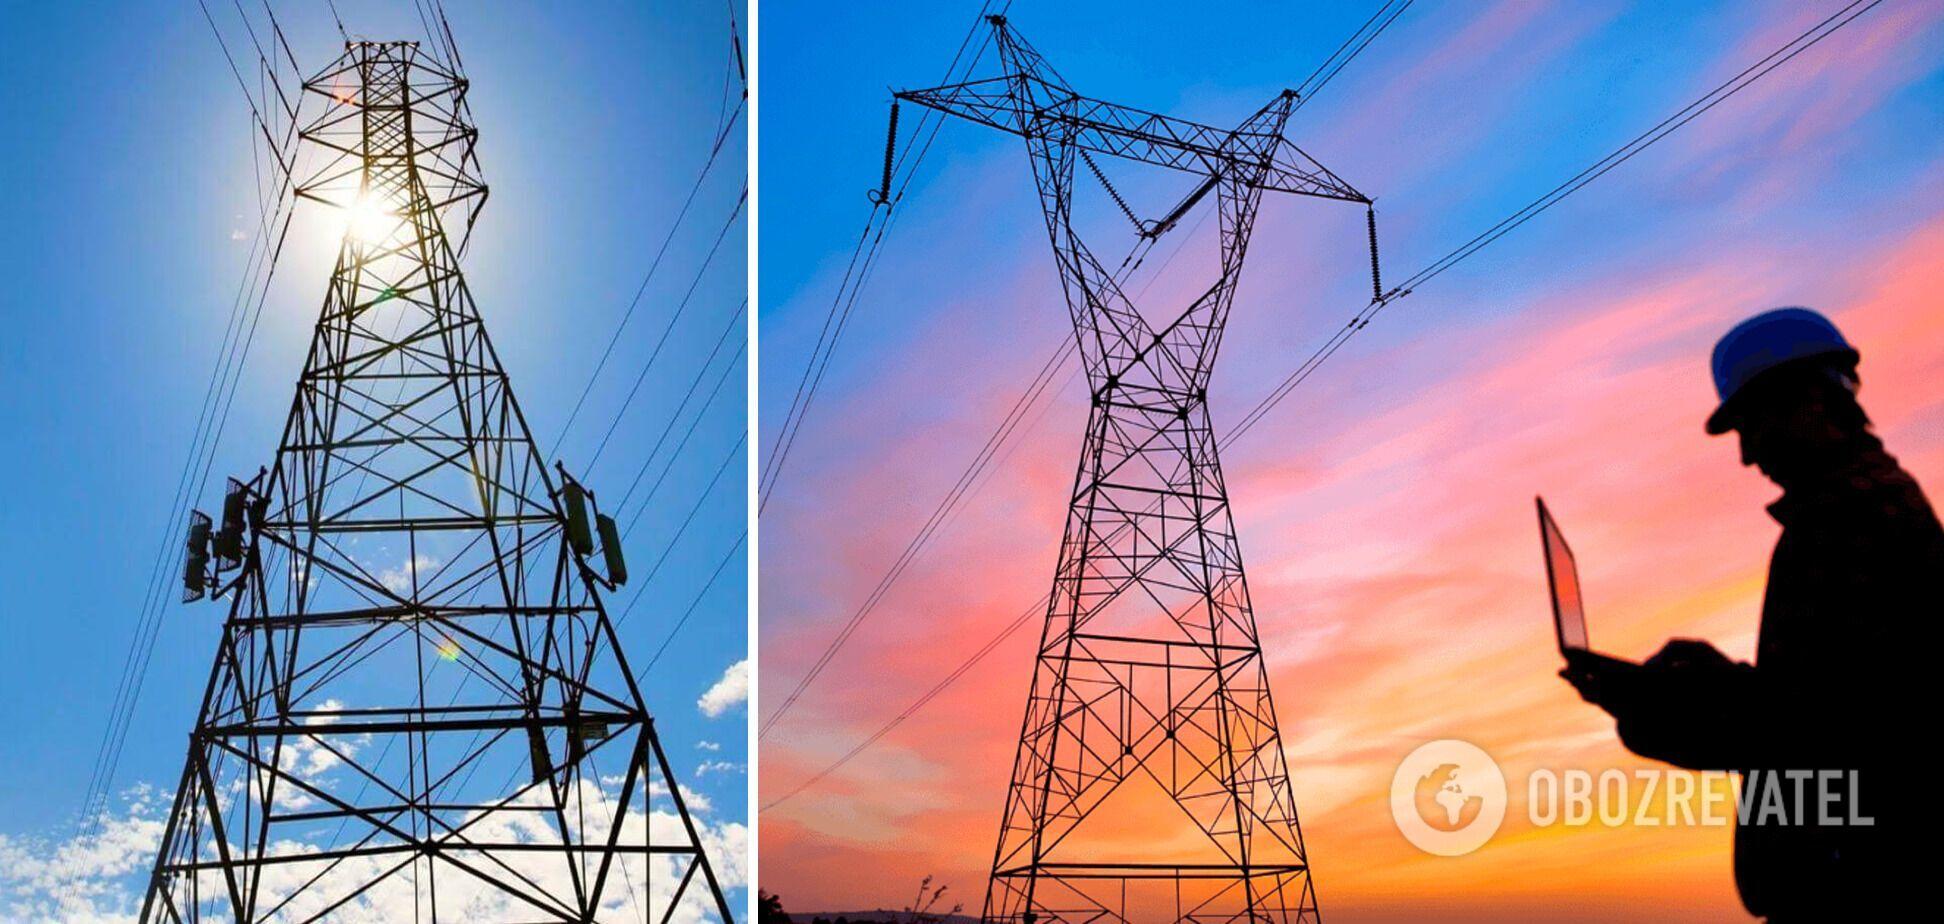 RAB-тариф даст развитие электросетям и принесет 72 млрд грн налогов в бюджет – ЦЭВ